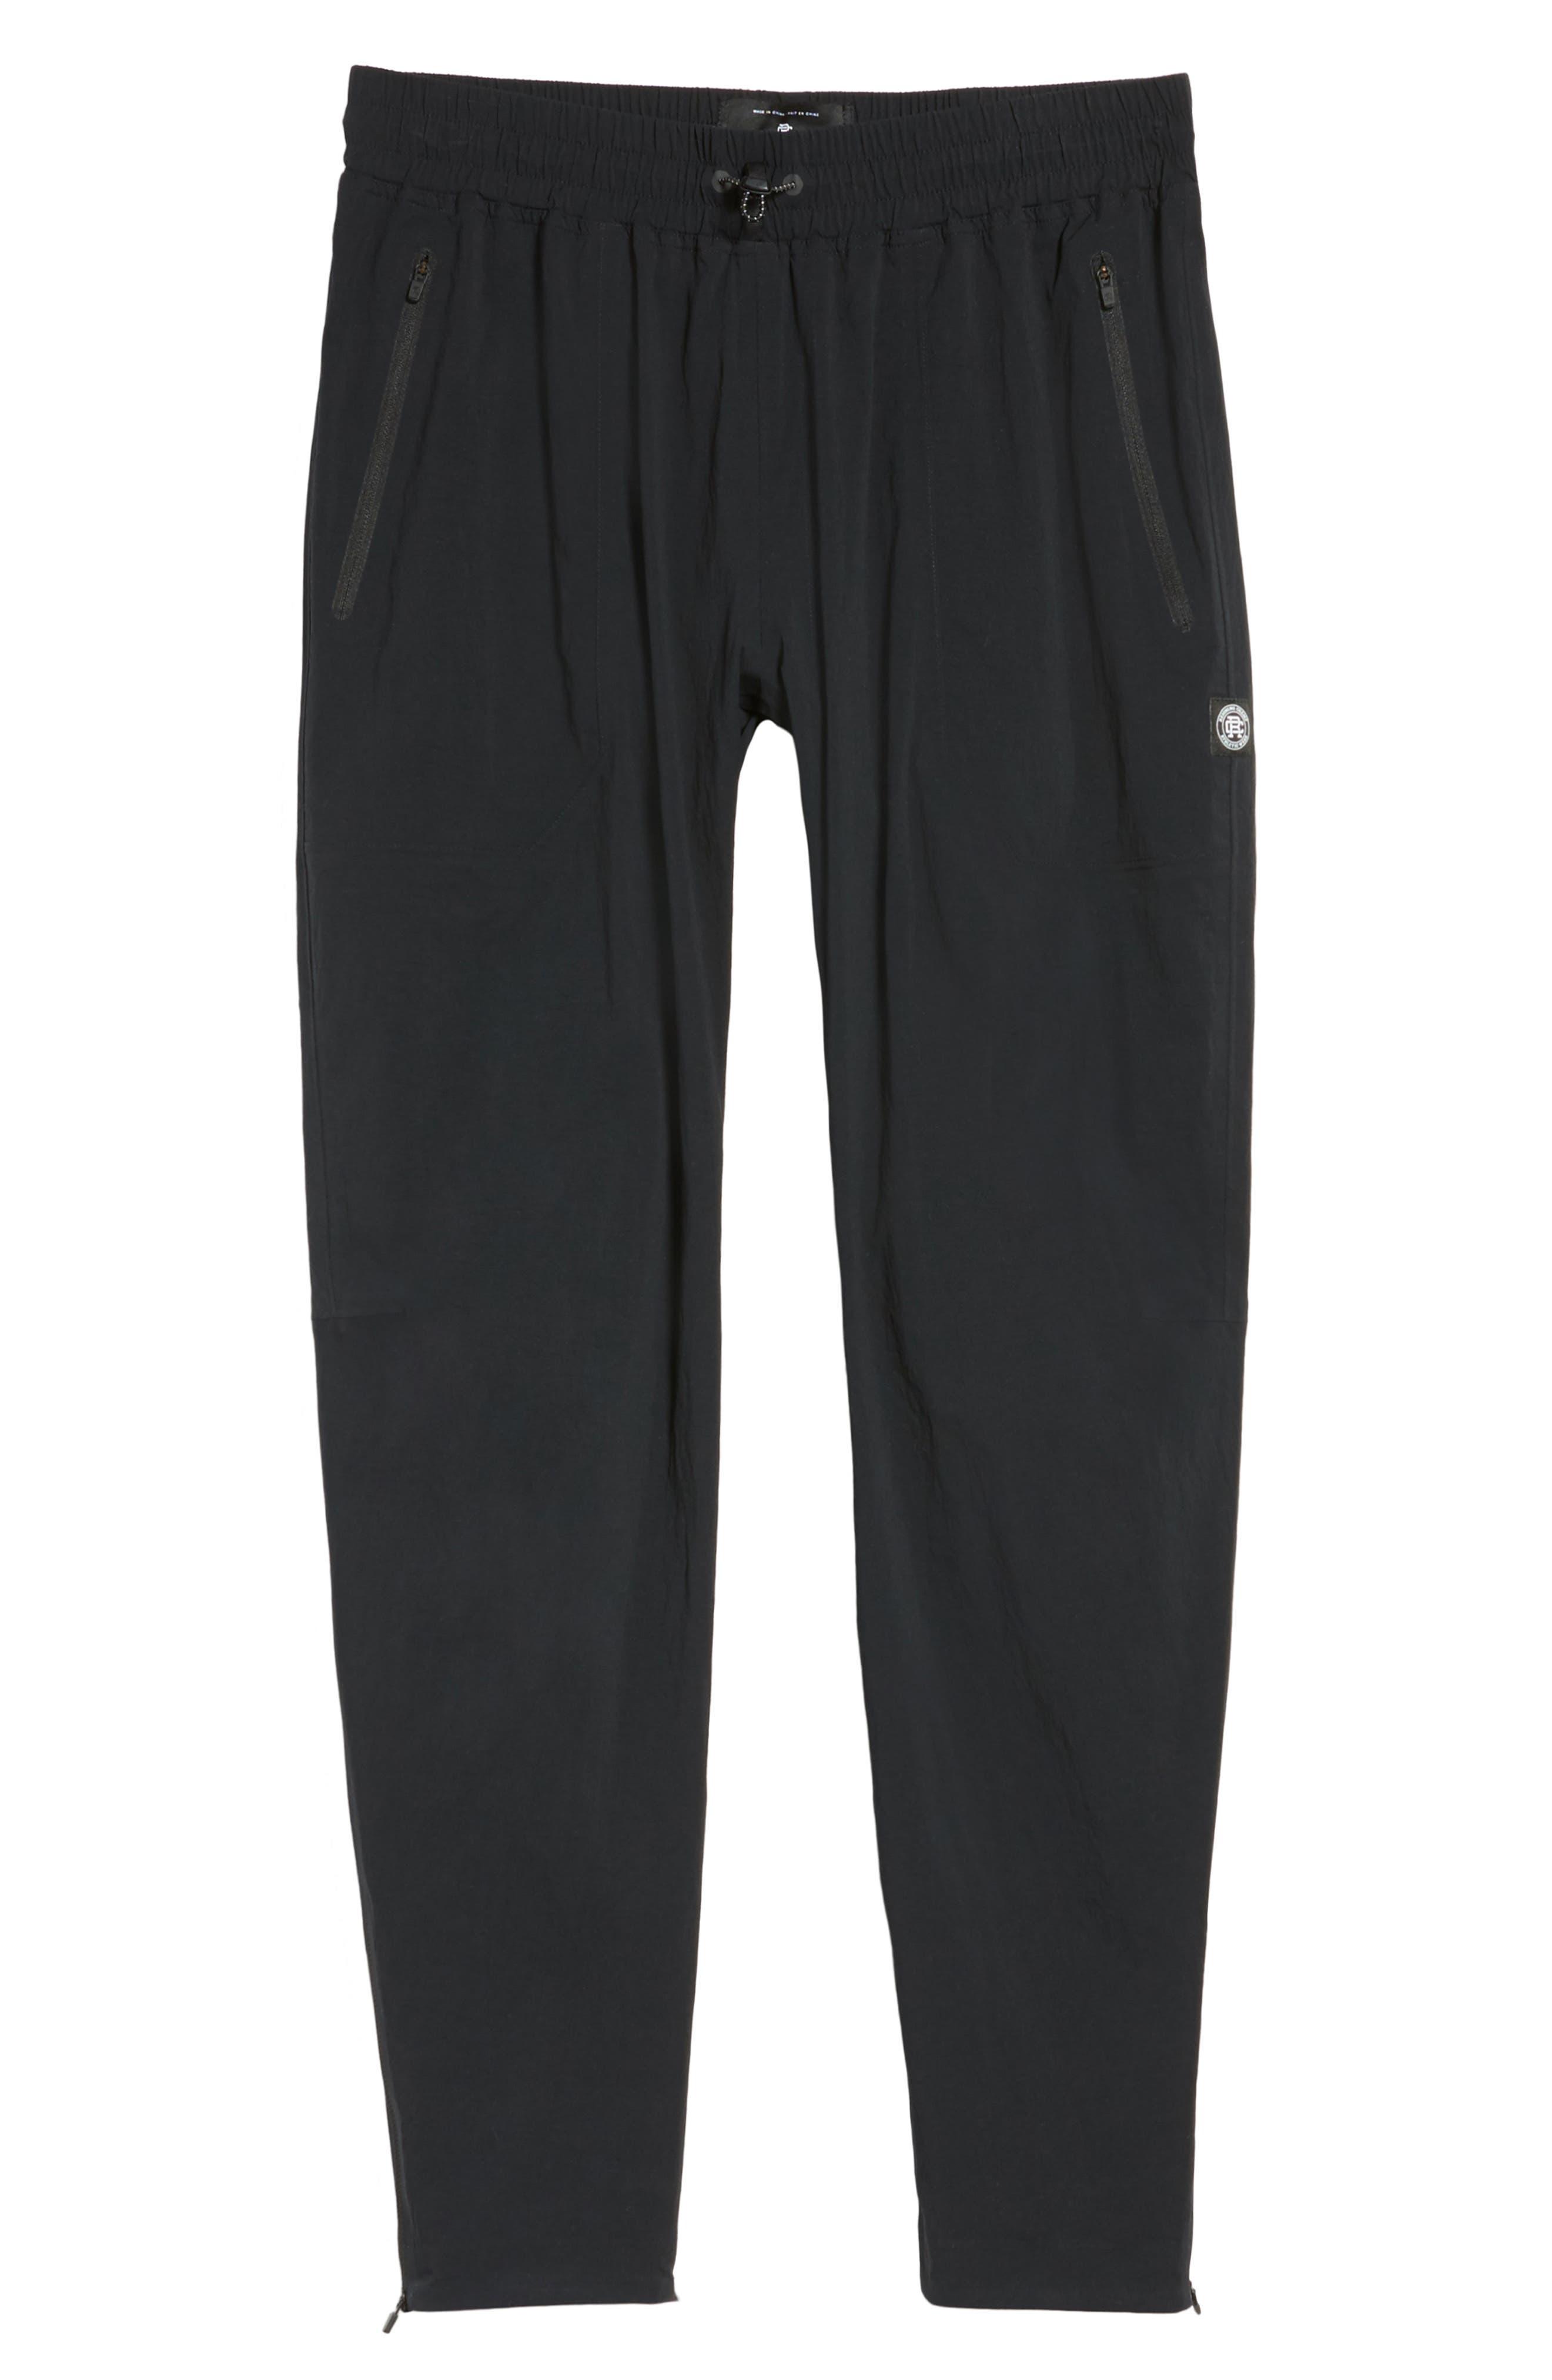 N279 Sweatpants,                             Alternate thumbnail 6, color,                             001